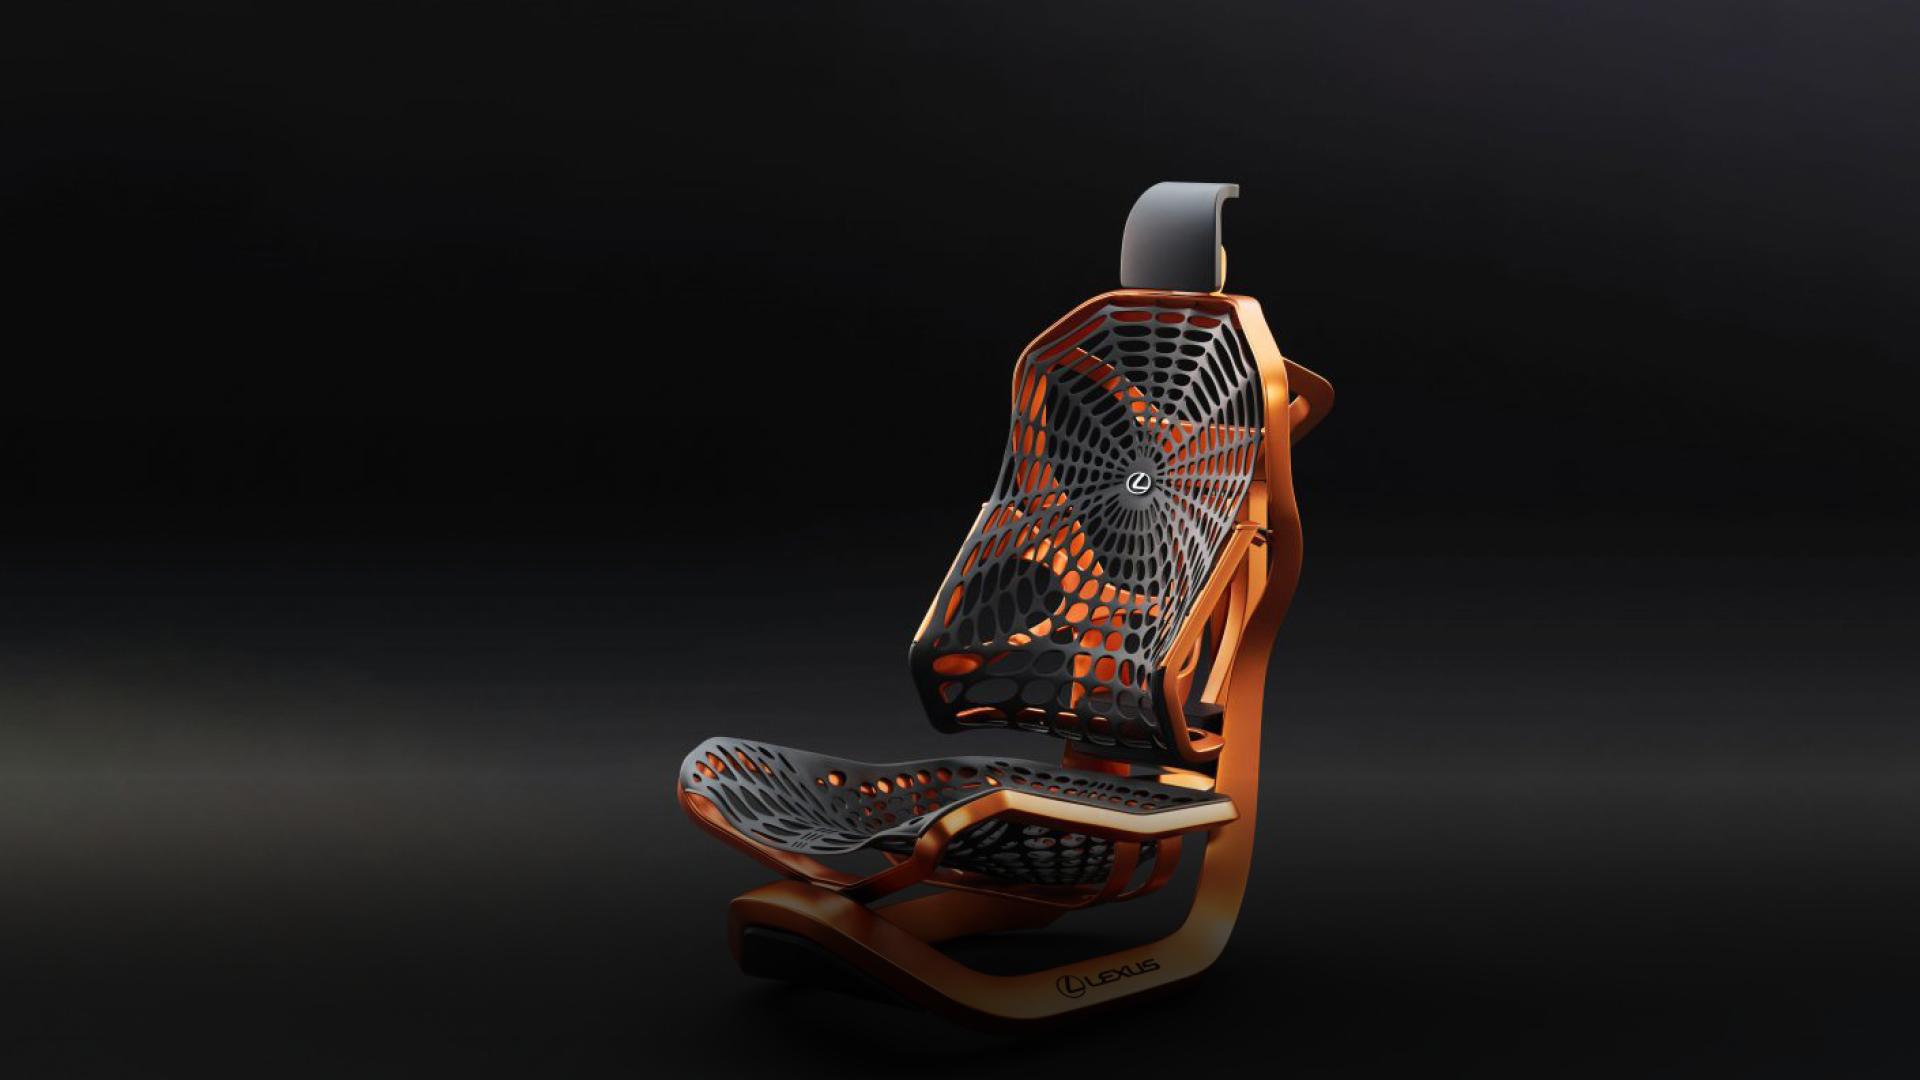 Seats Hub Image